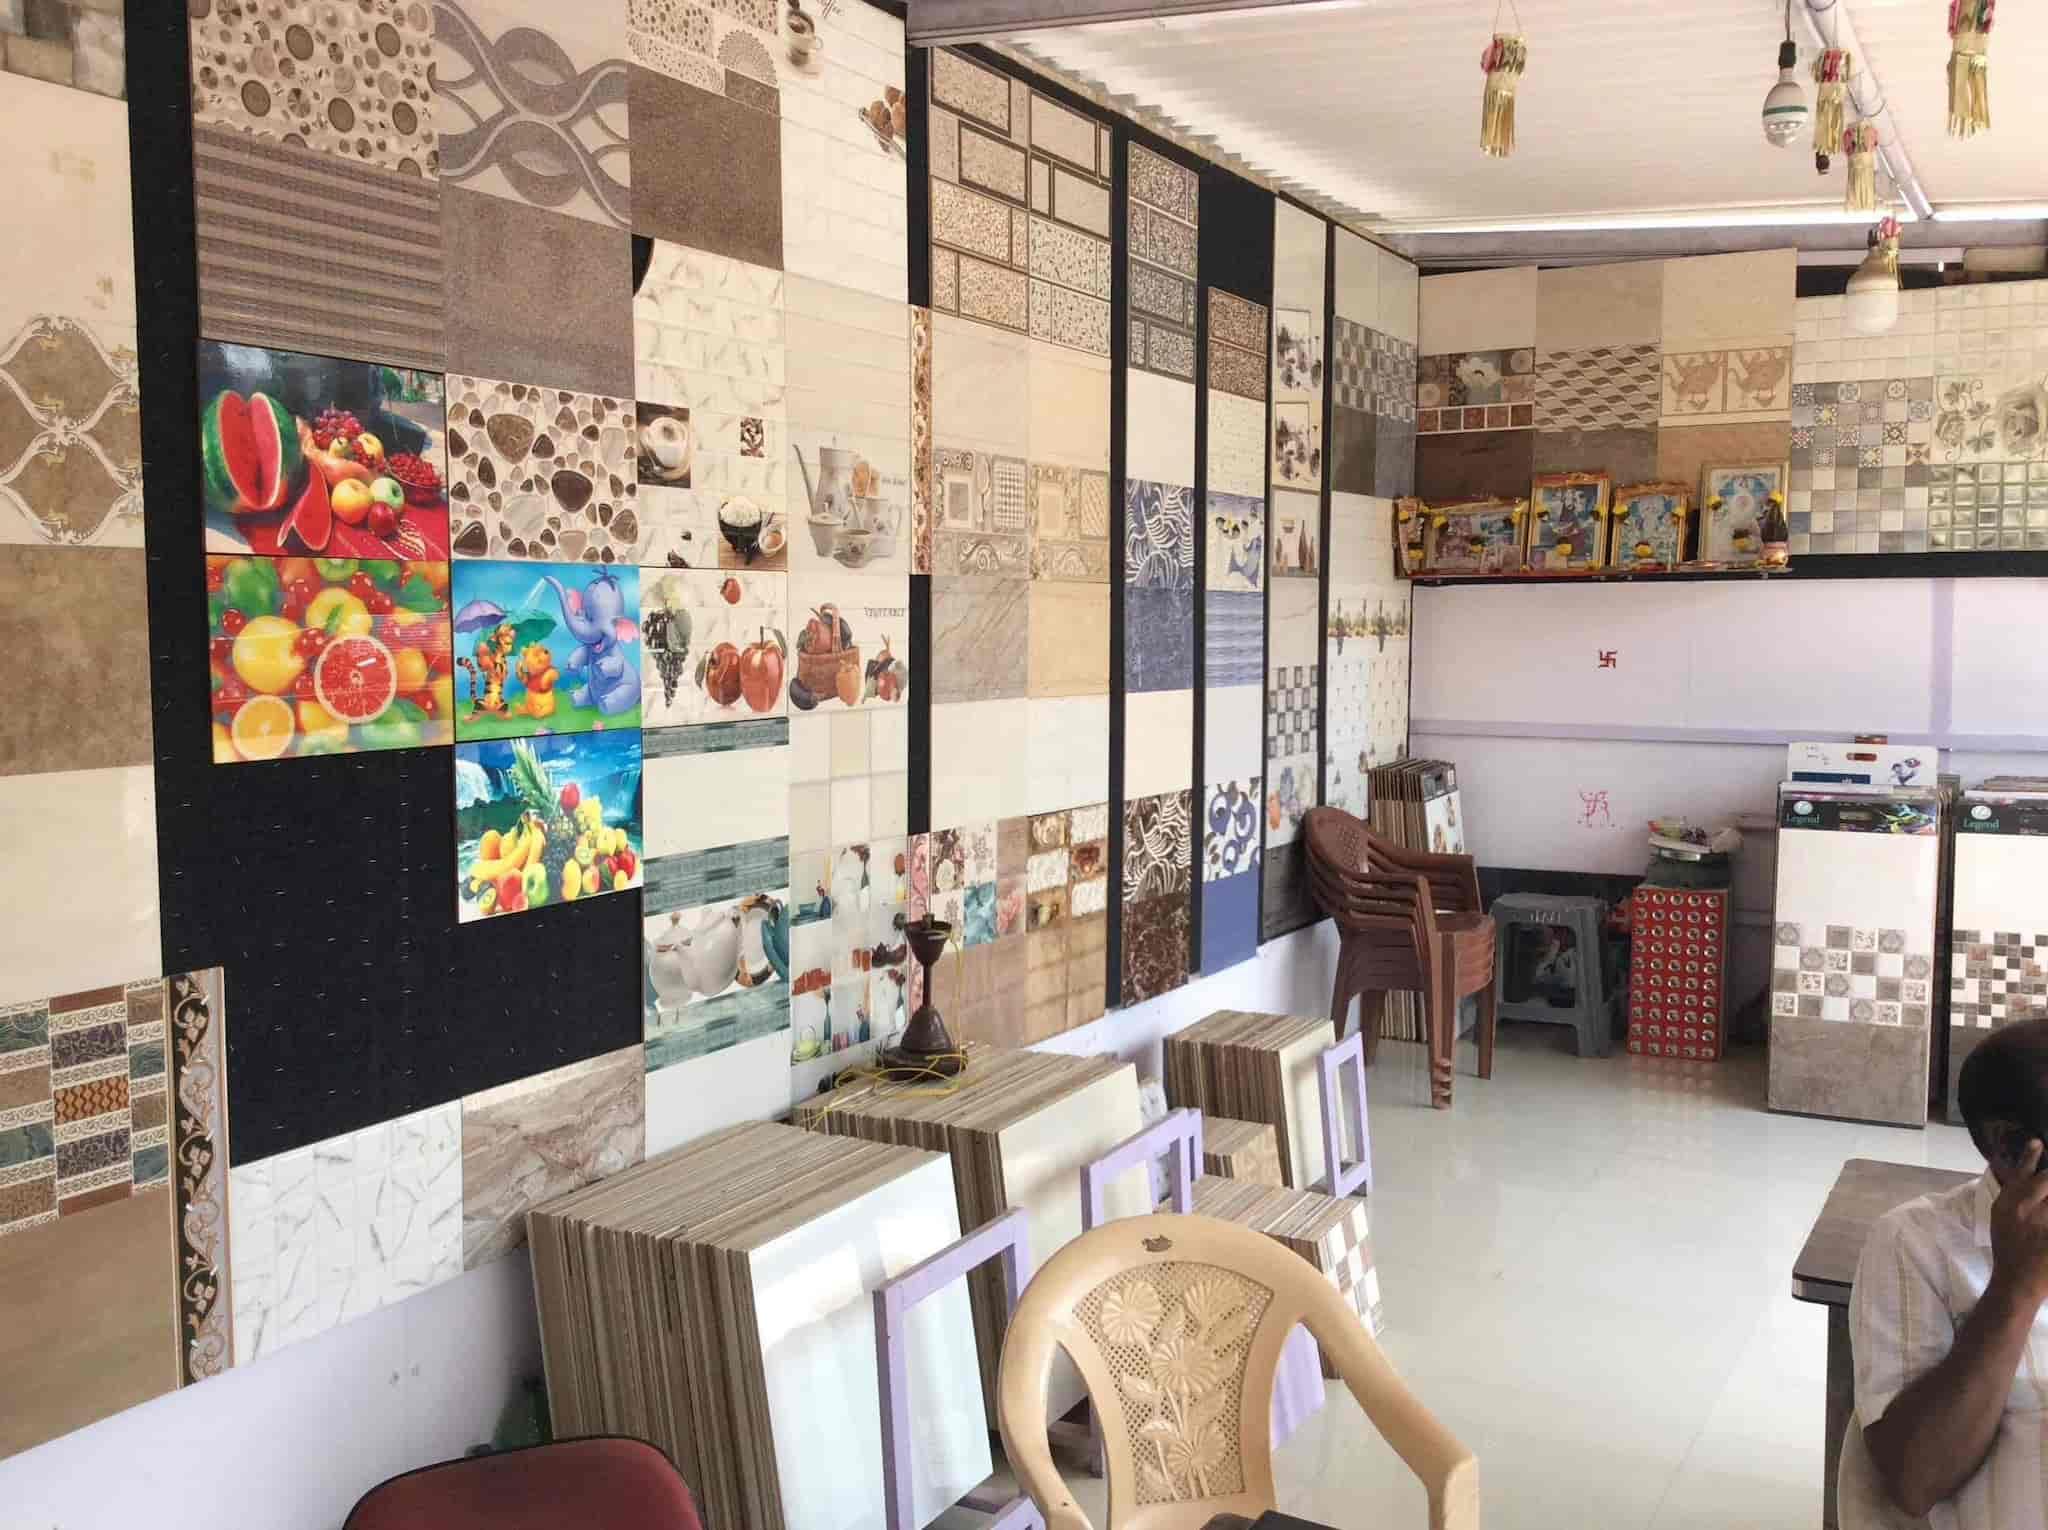 New Ashapura Marble Photos, Badlapur Ed, Mumbai- Pictures & Images